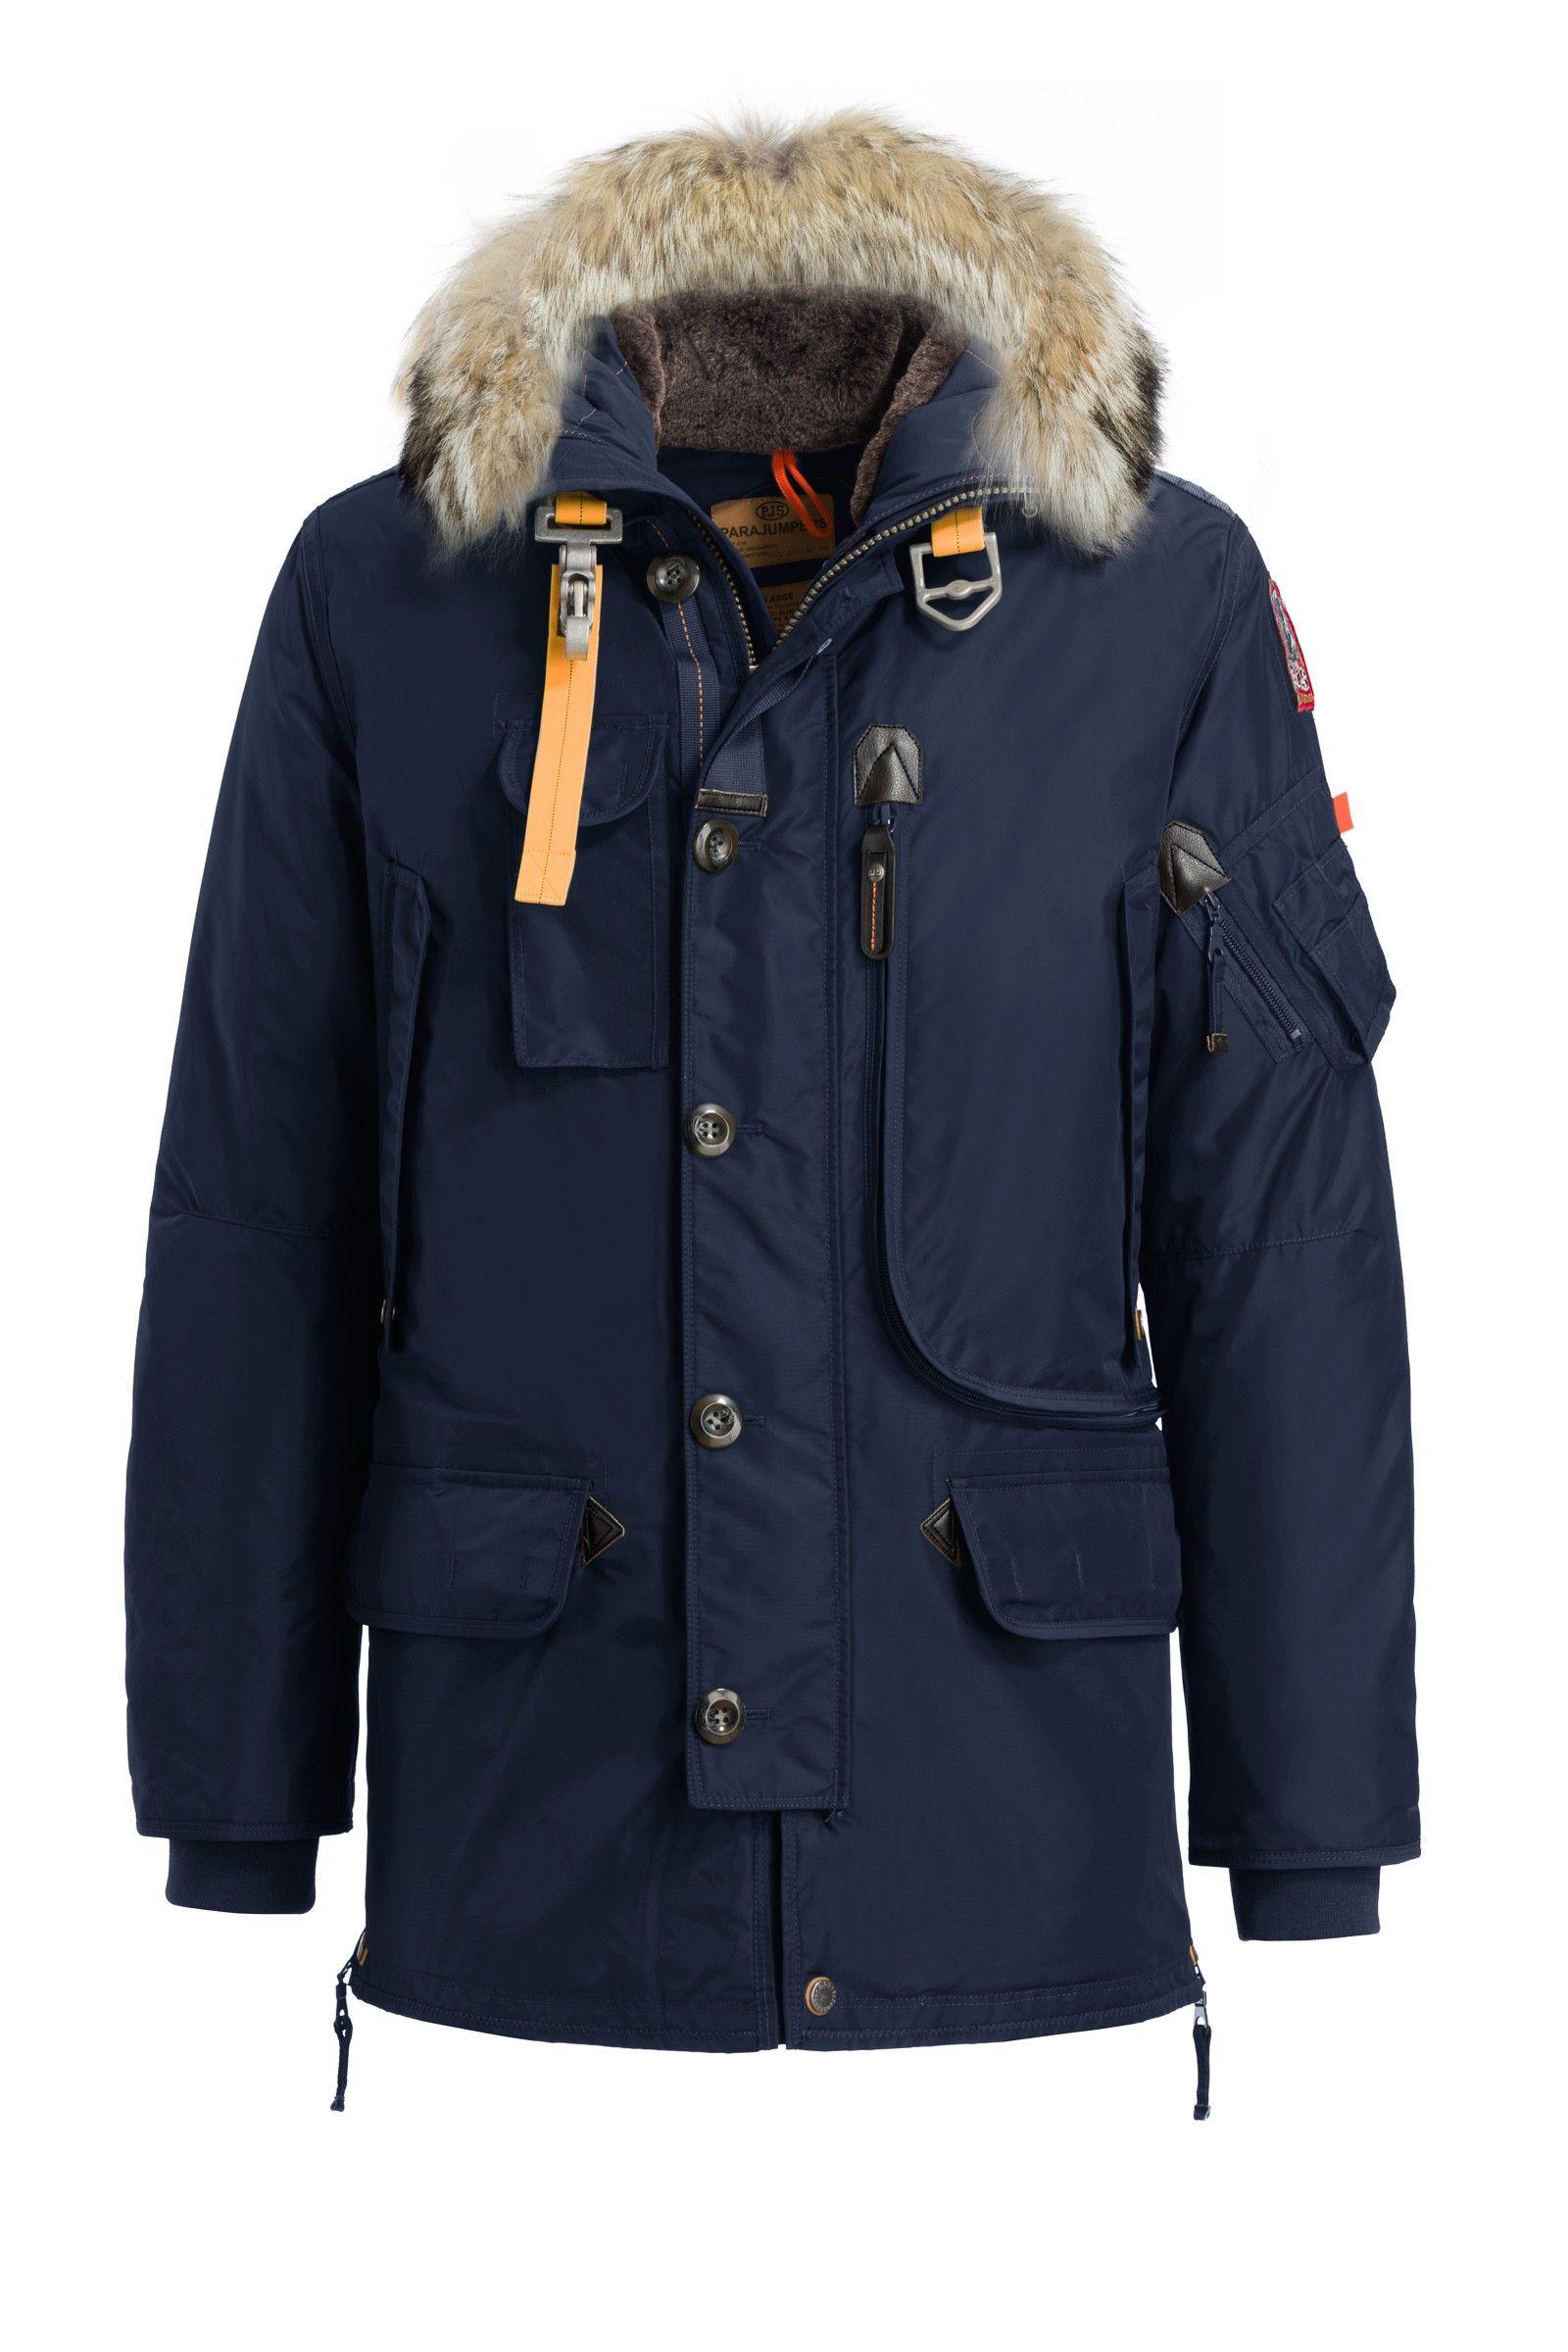 4e96dfb6f9 ... cheap 2017 hot sale luxury parajumpers mens kodiak down jacket hoodies  fur fashionable winter coats warm